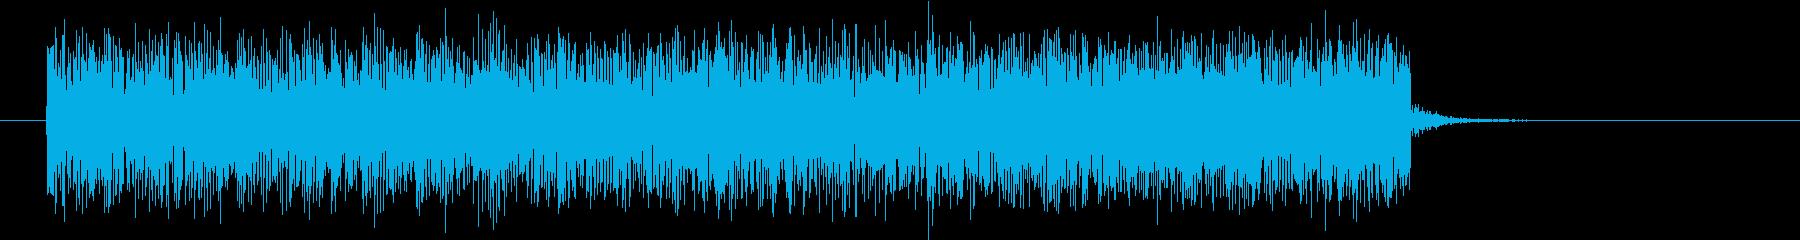 A light, near-future techno pop jingle's reproduced waveform